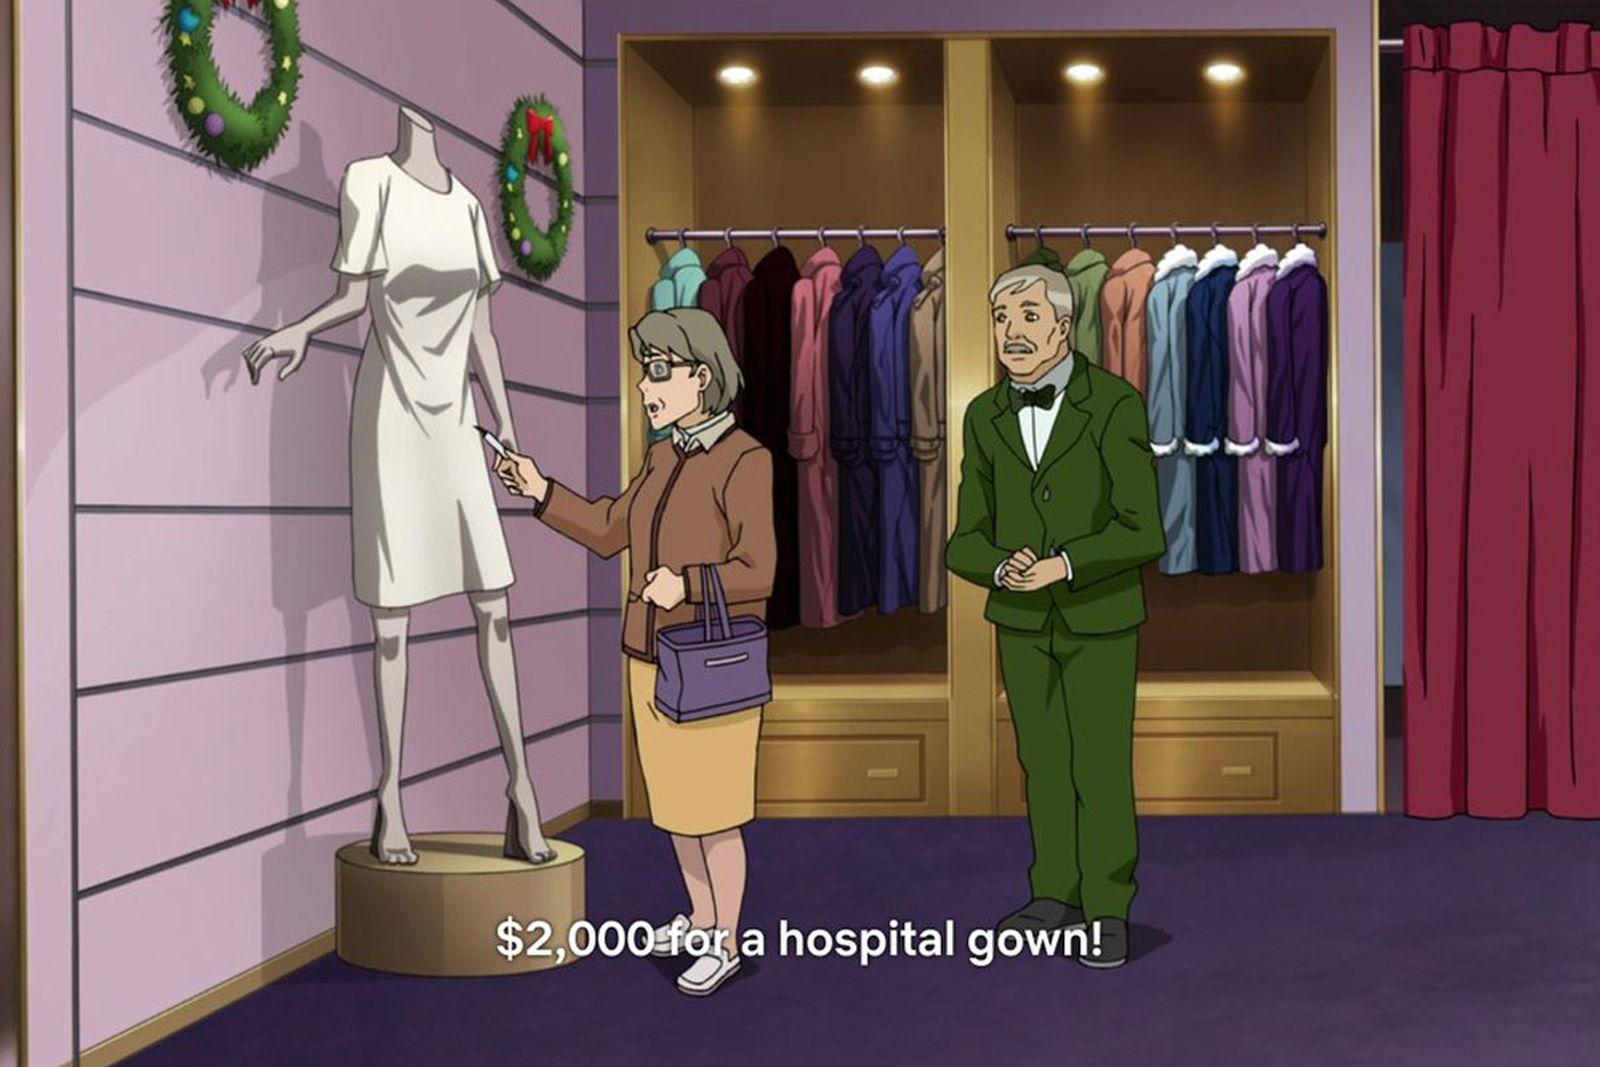 neo yokio pink christmas fashion references anime jaden smith netflix